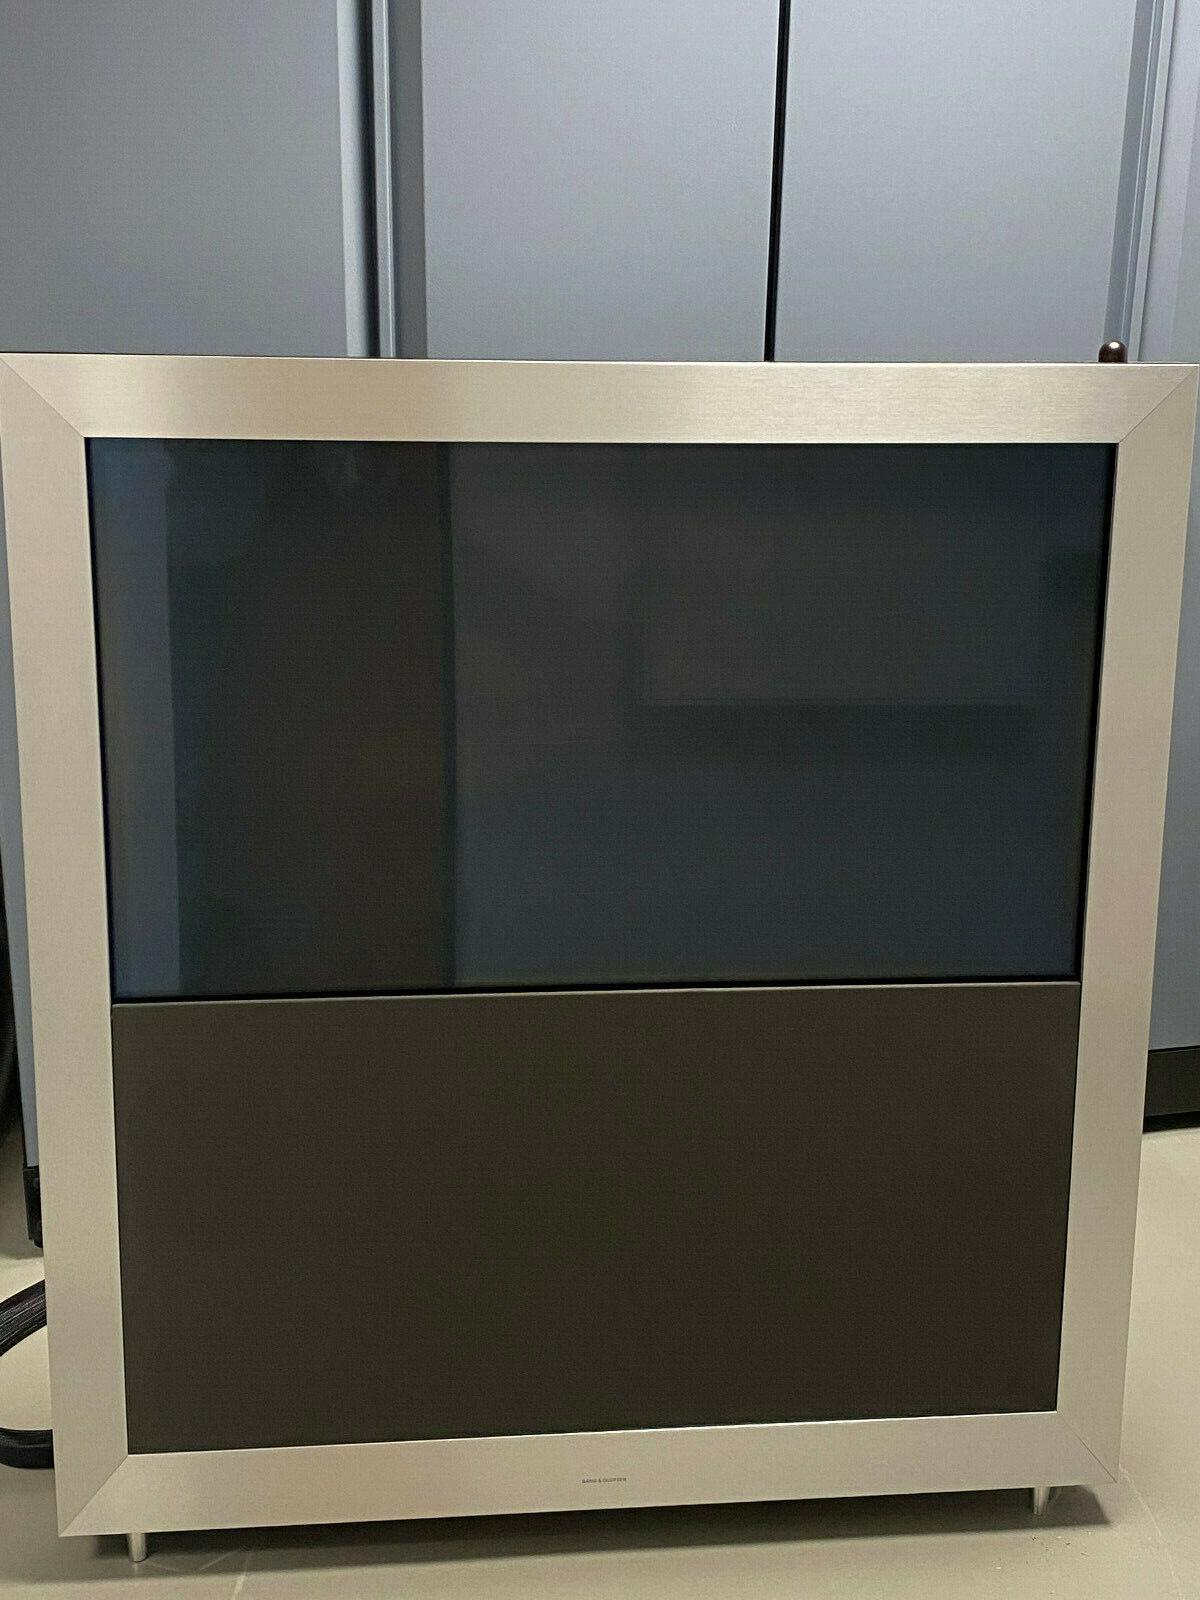 Bang & Olufsen BeoVision5 Type 8910, 106,7 cm (42 Zoll) 720p HD Plasma Fernseher